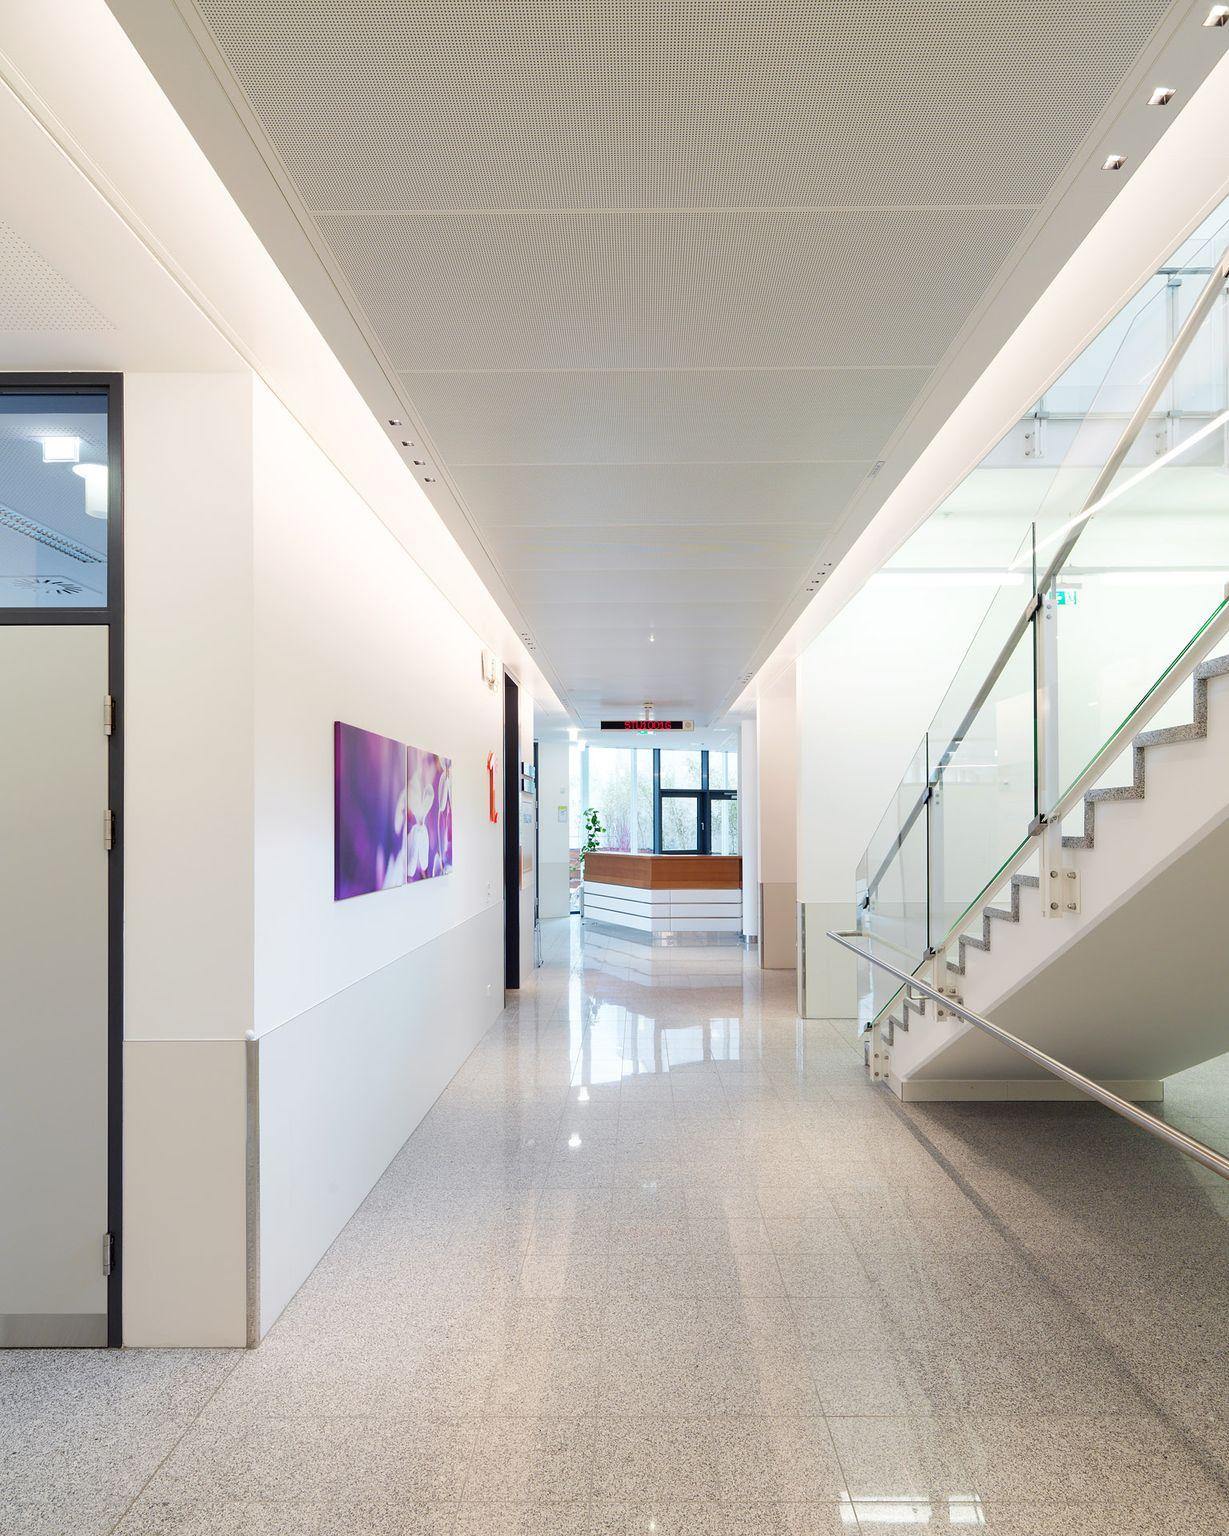 Corridor Ernst Giselbrecht / Paul Ott